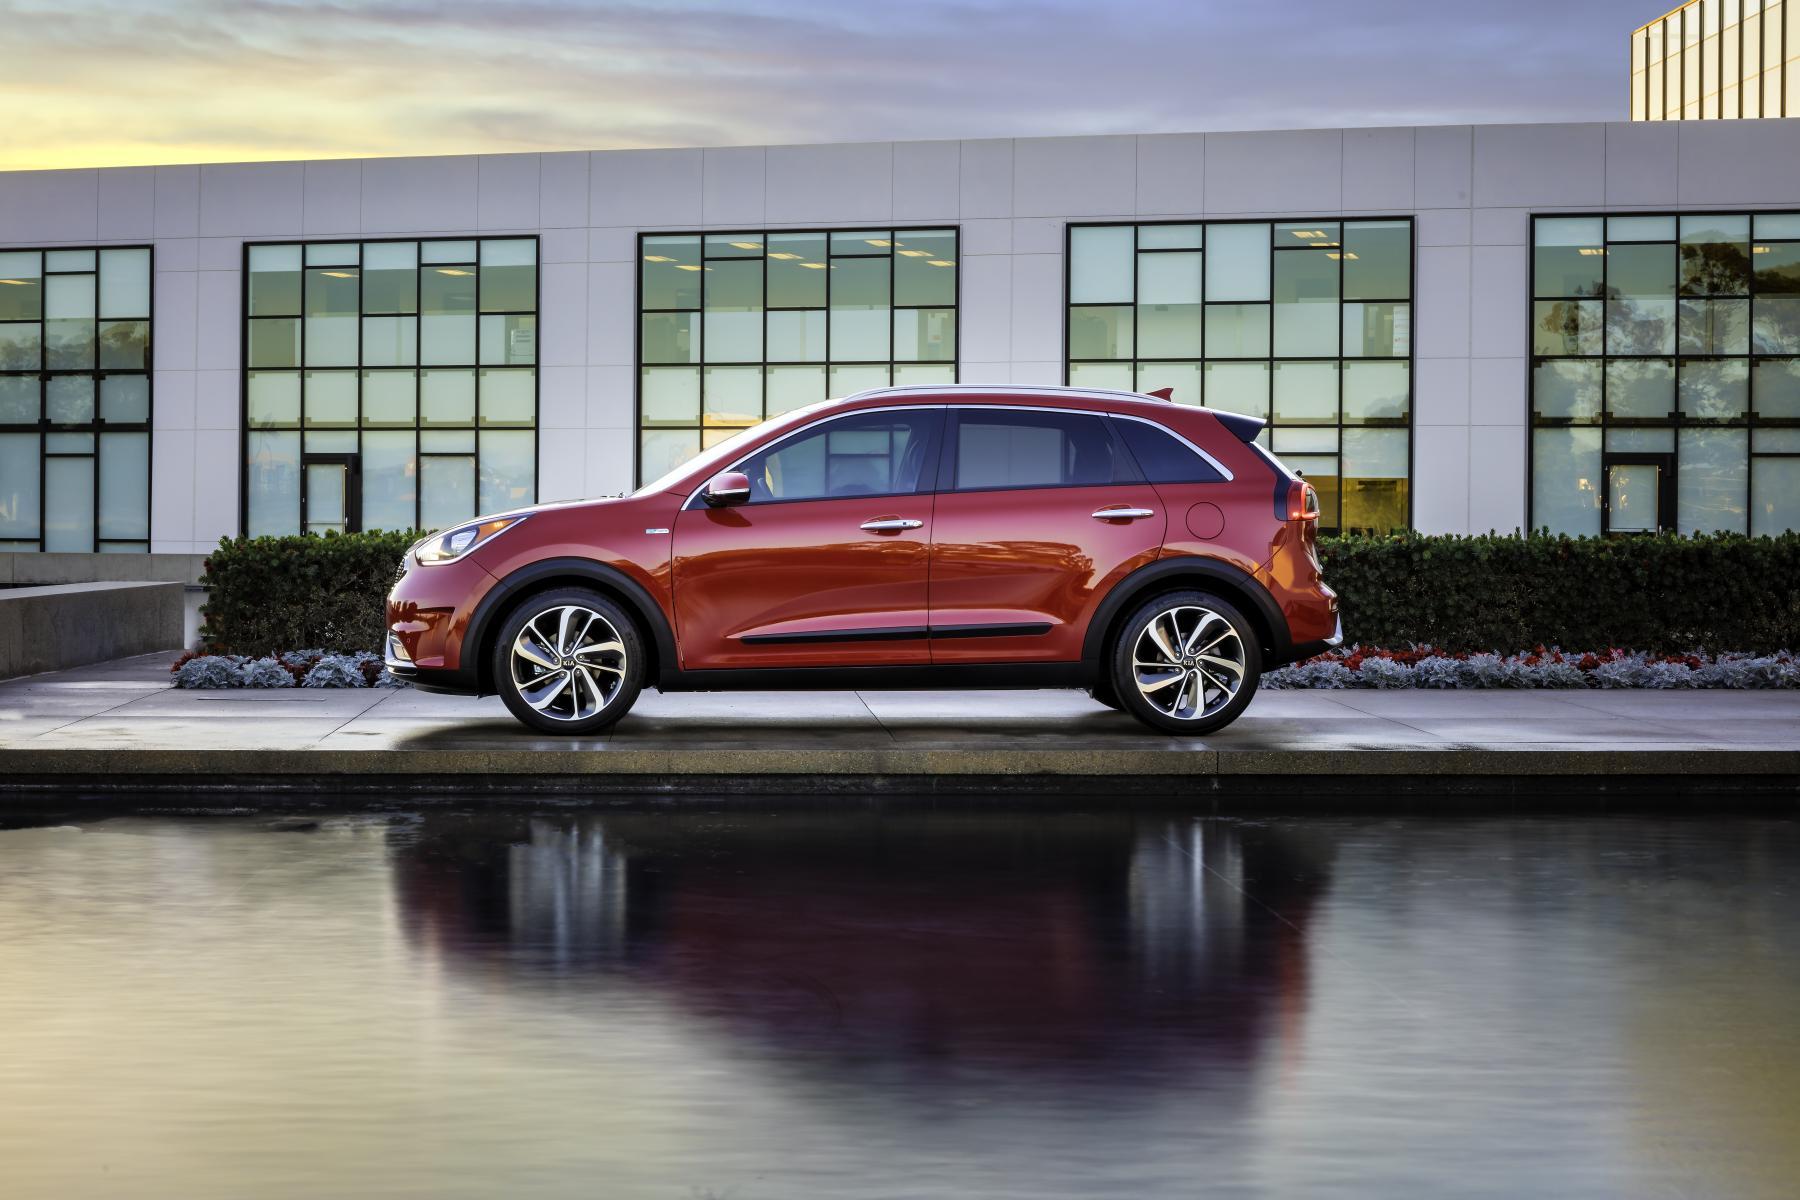 Kia Niro Electric Confirmed For 2018, To Use Hyundai Ioniq ...